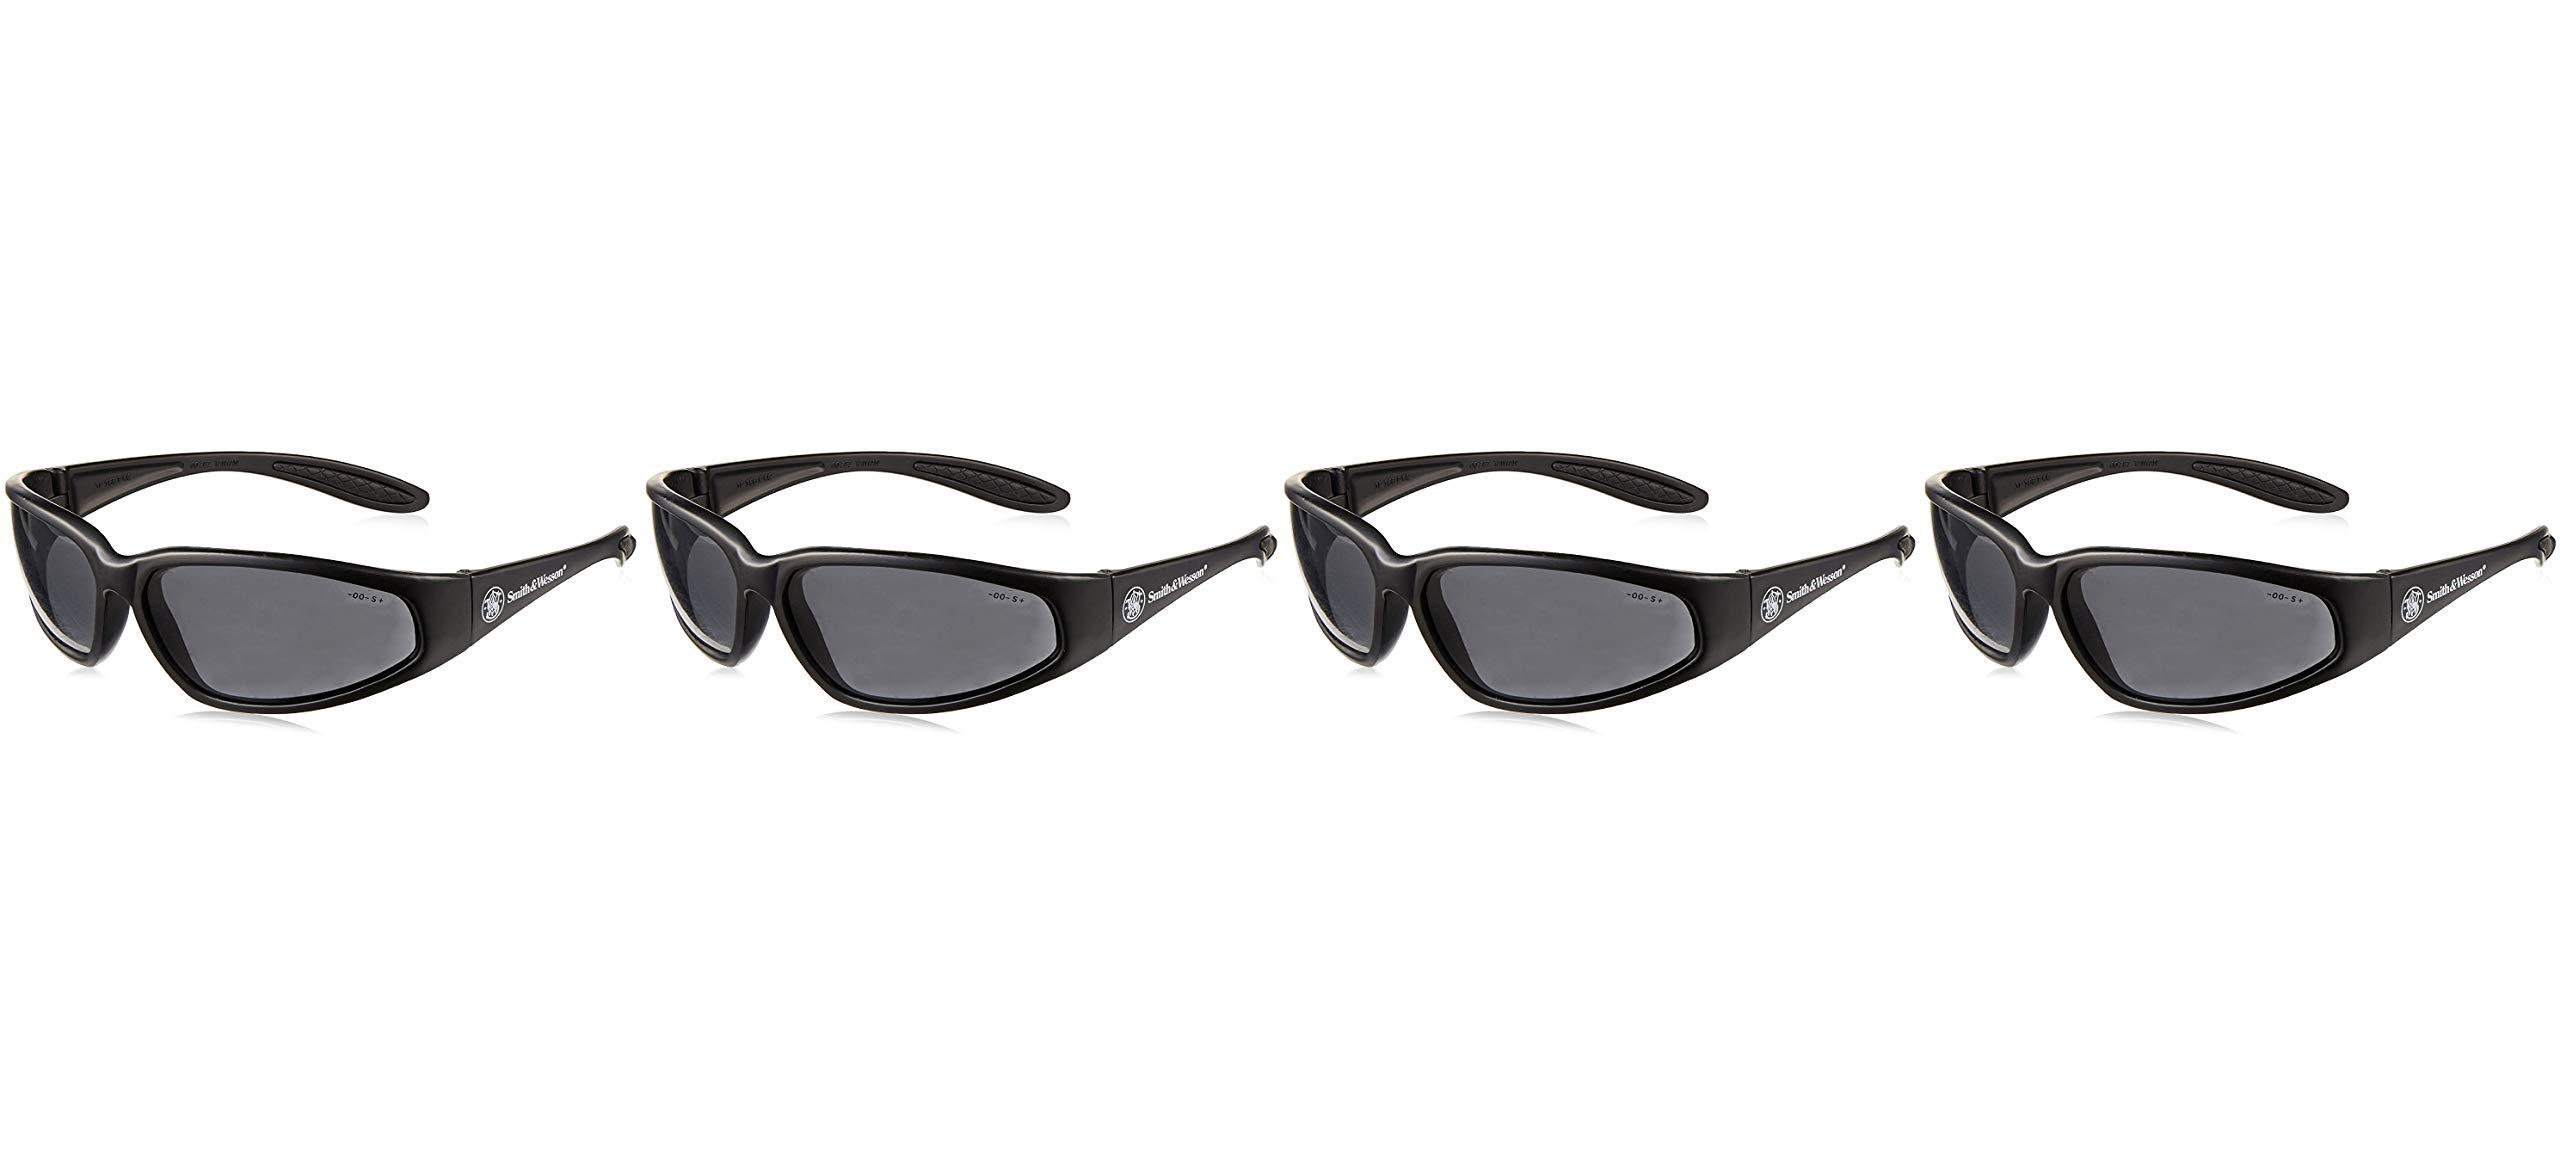 Smith & Wesson 138-19859 38 Special Safety Eyewear, Polycarbonate Anti-Scratch Lenses, Black Nylon Frame, One Size, Smoke (Fоur Paсk) by Smith & Wesson